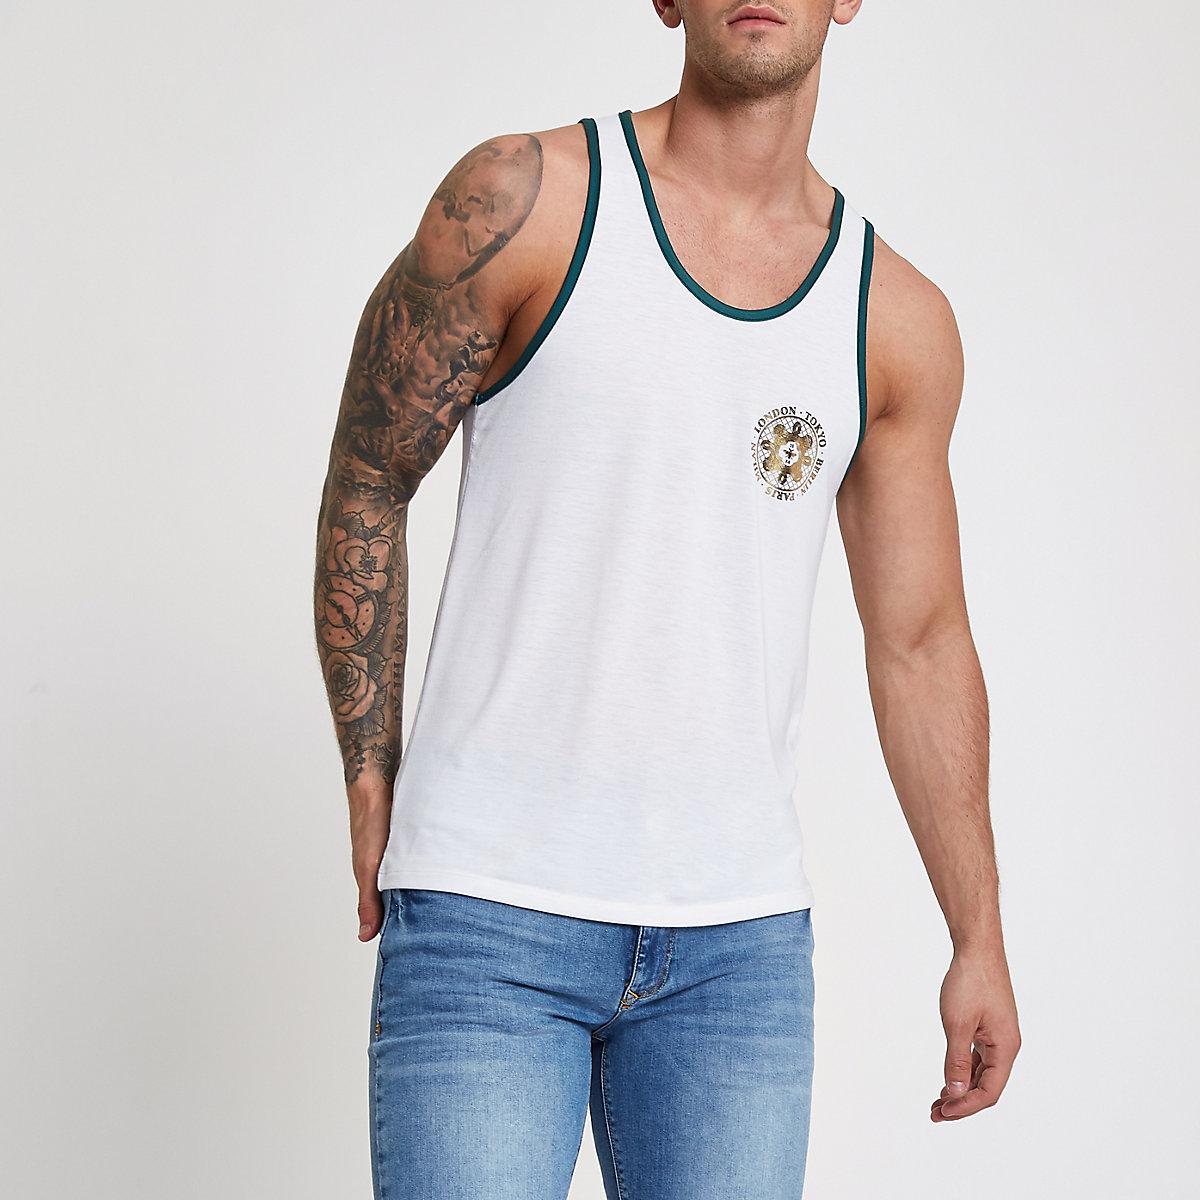 White slim fit back print tank top